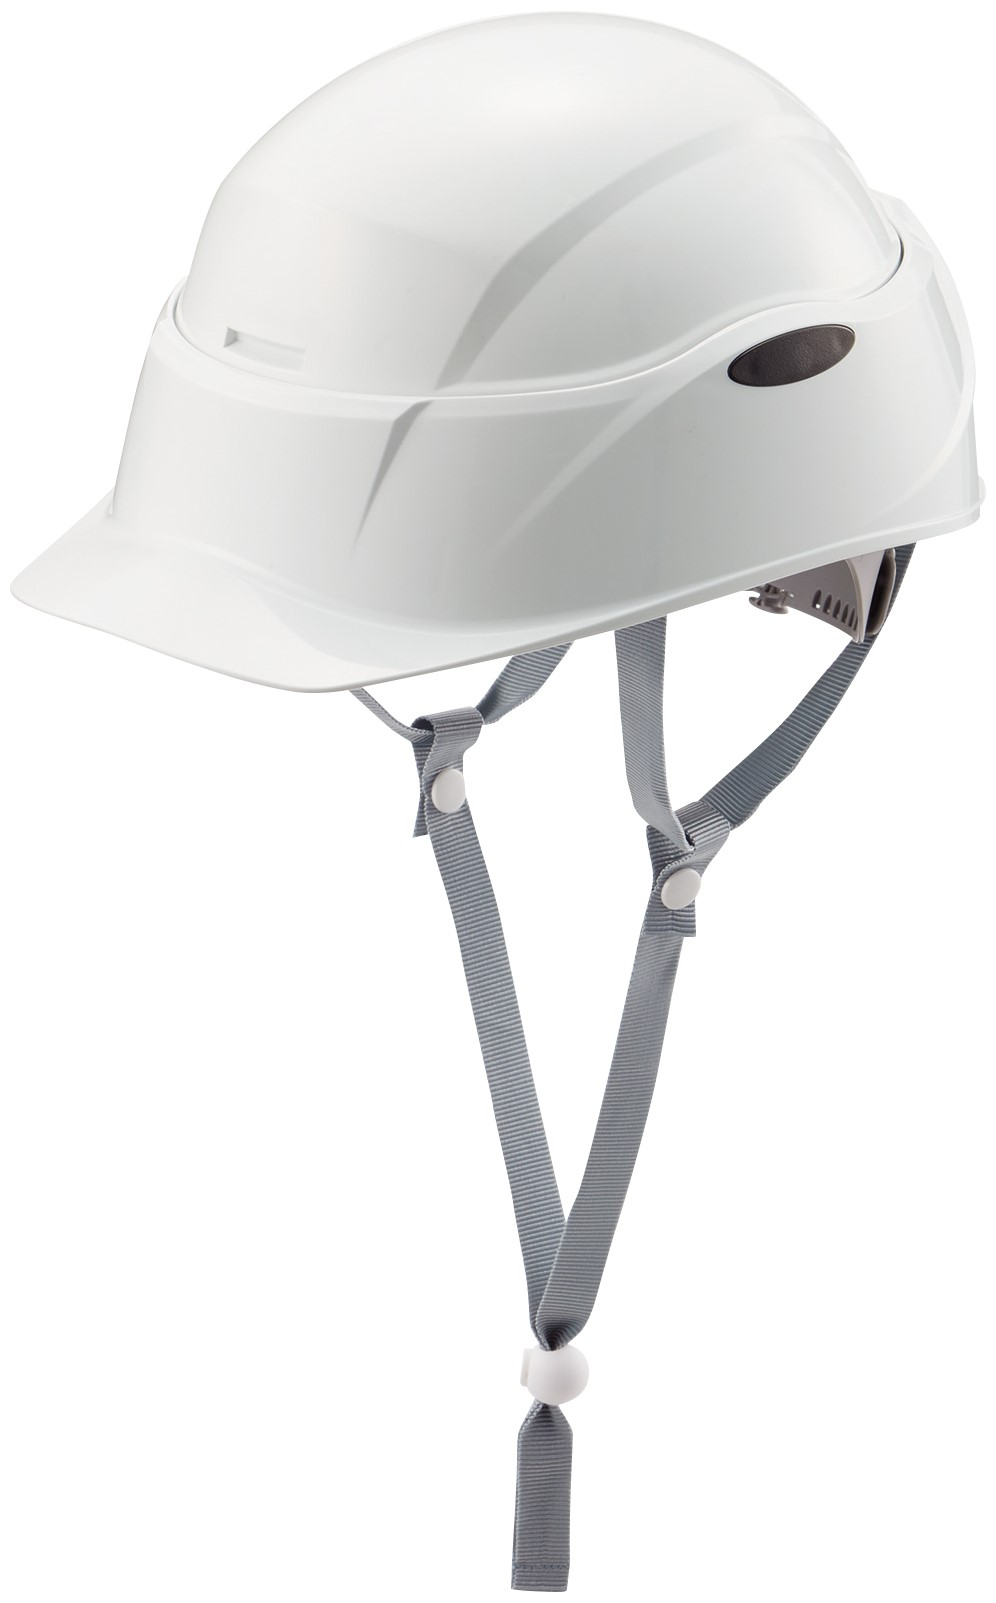 PARTS-FIT オフィス防災用ヘルメット<Crubo> 3個入 白